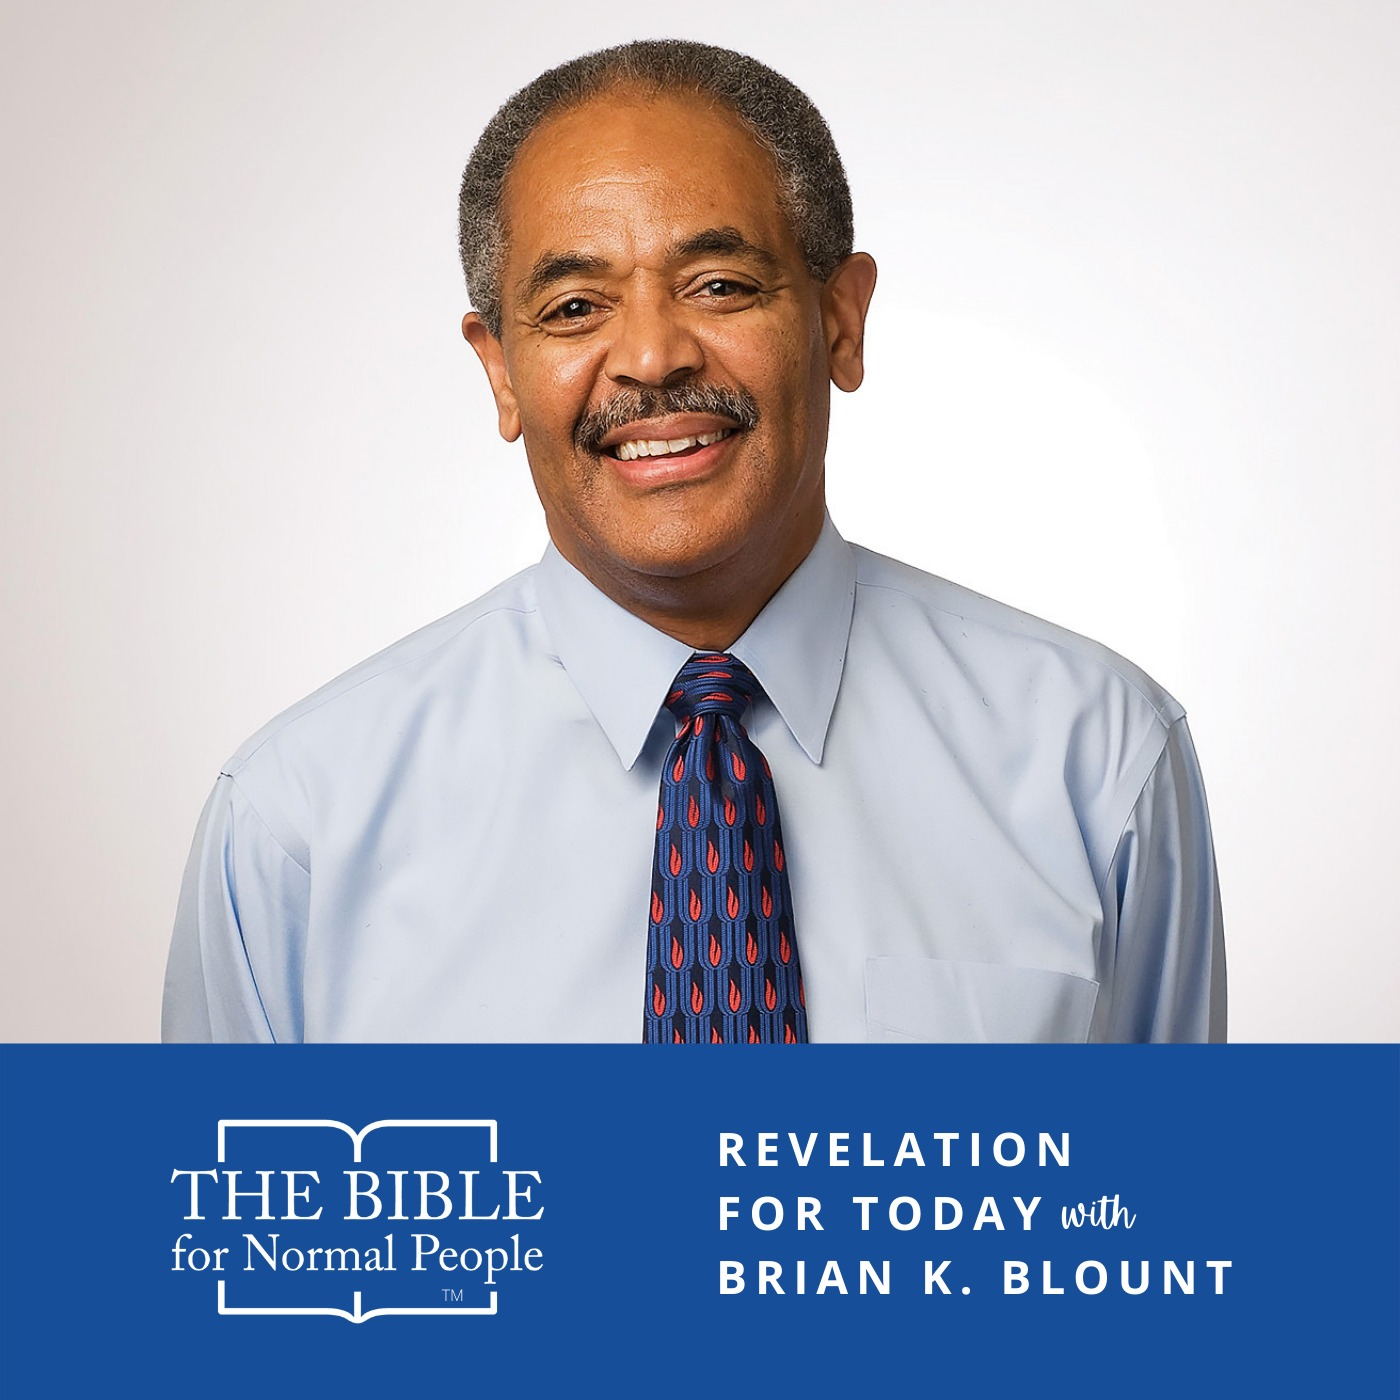 Episode 180: Brian K. Blount - Revelation for Today